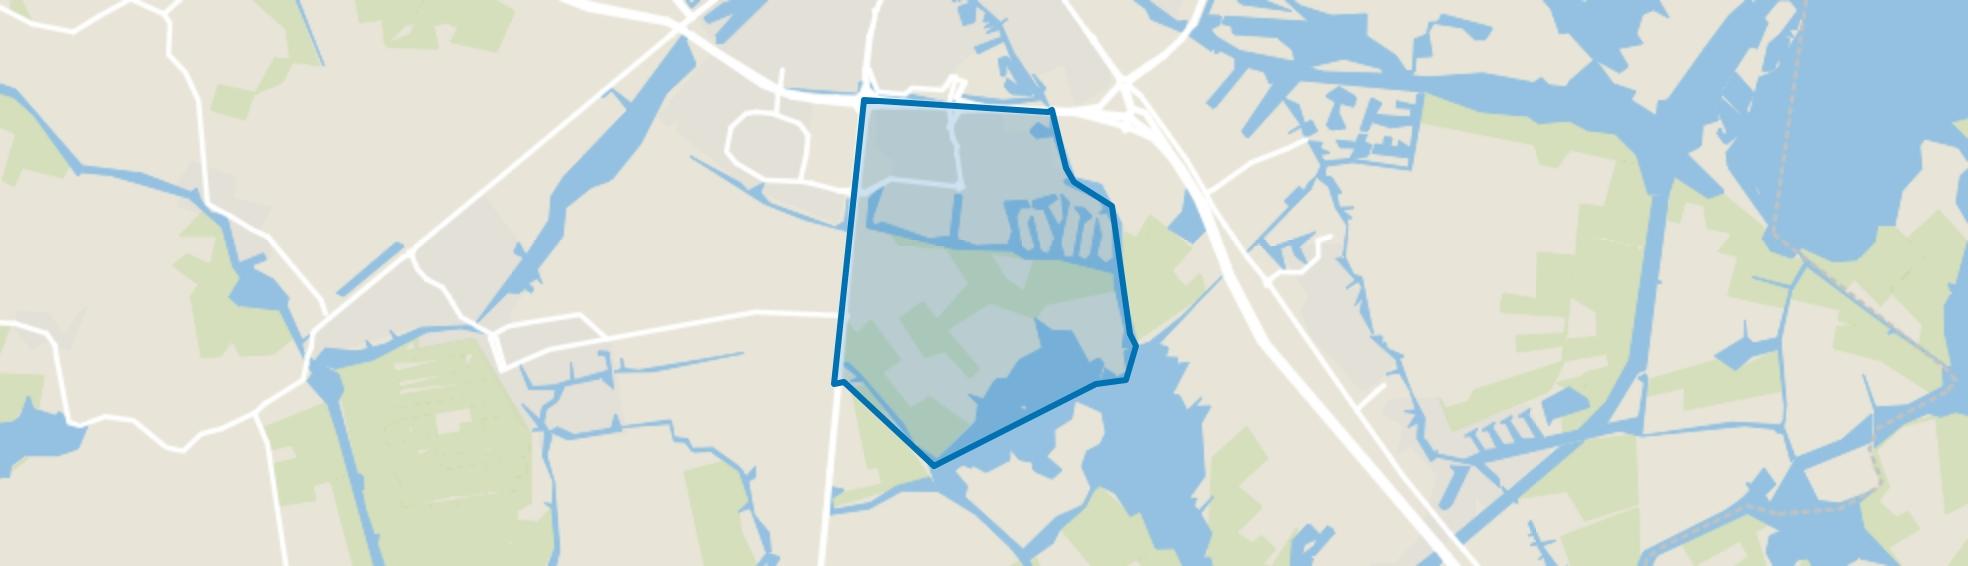 Duinterpen, Sneek map